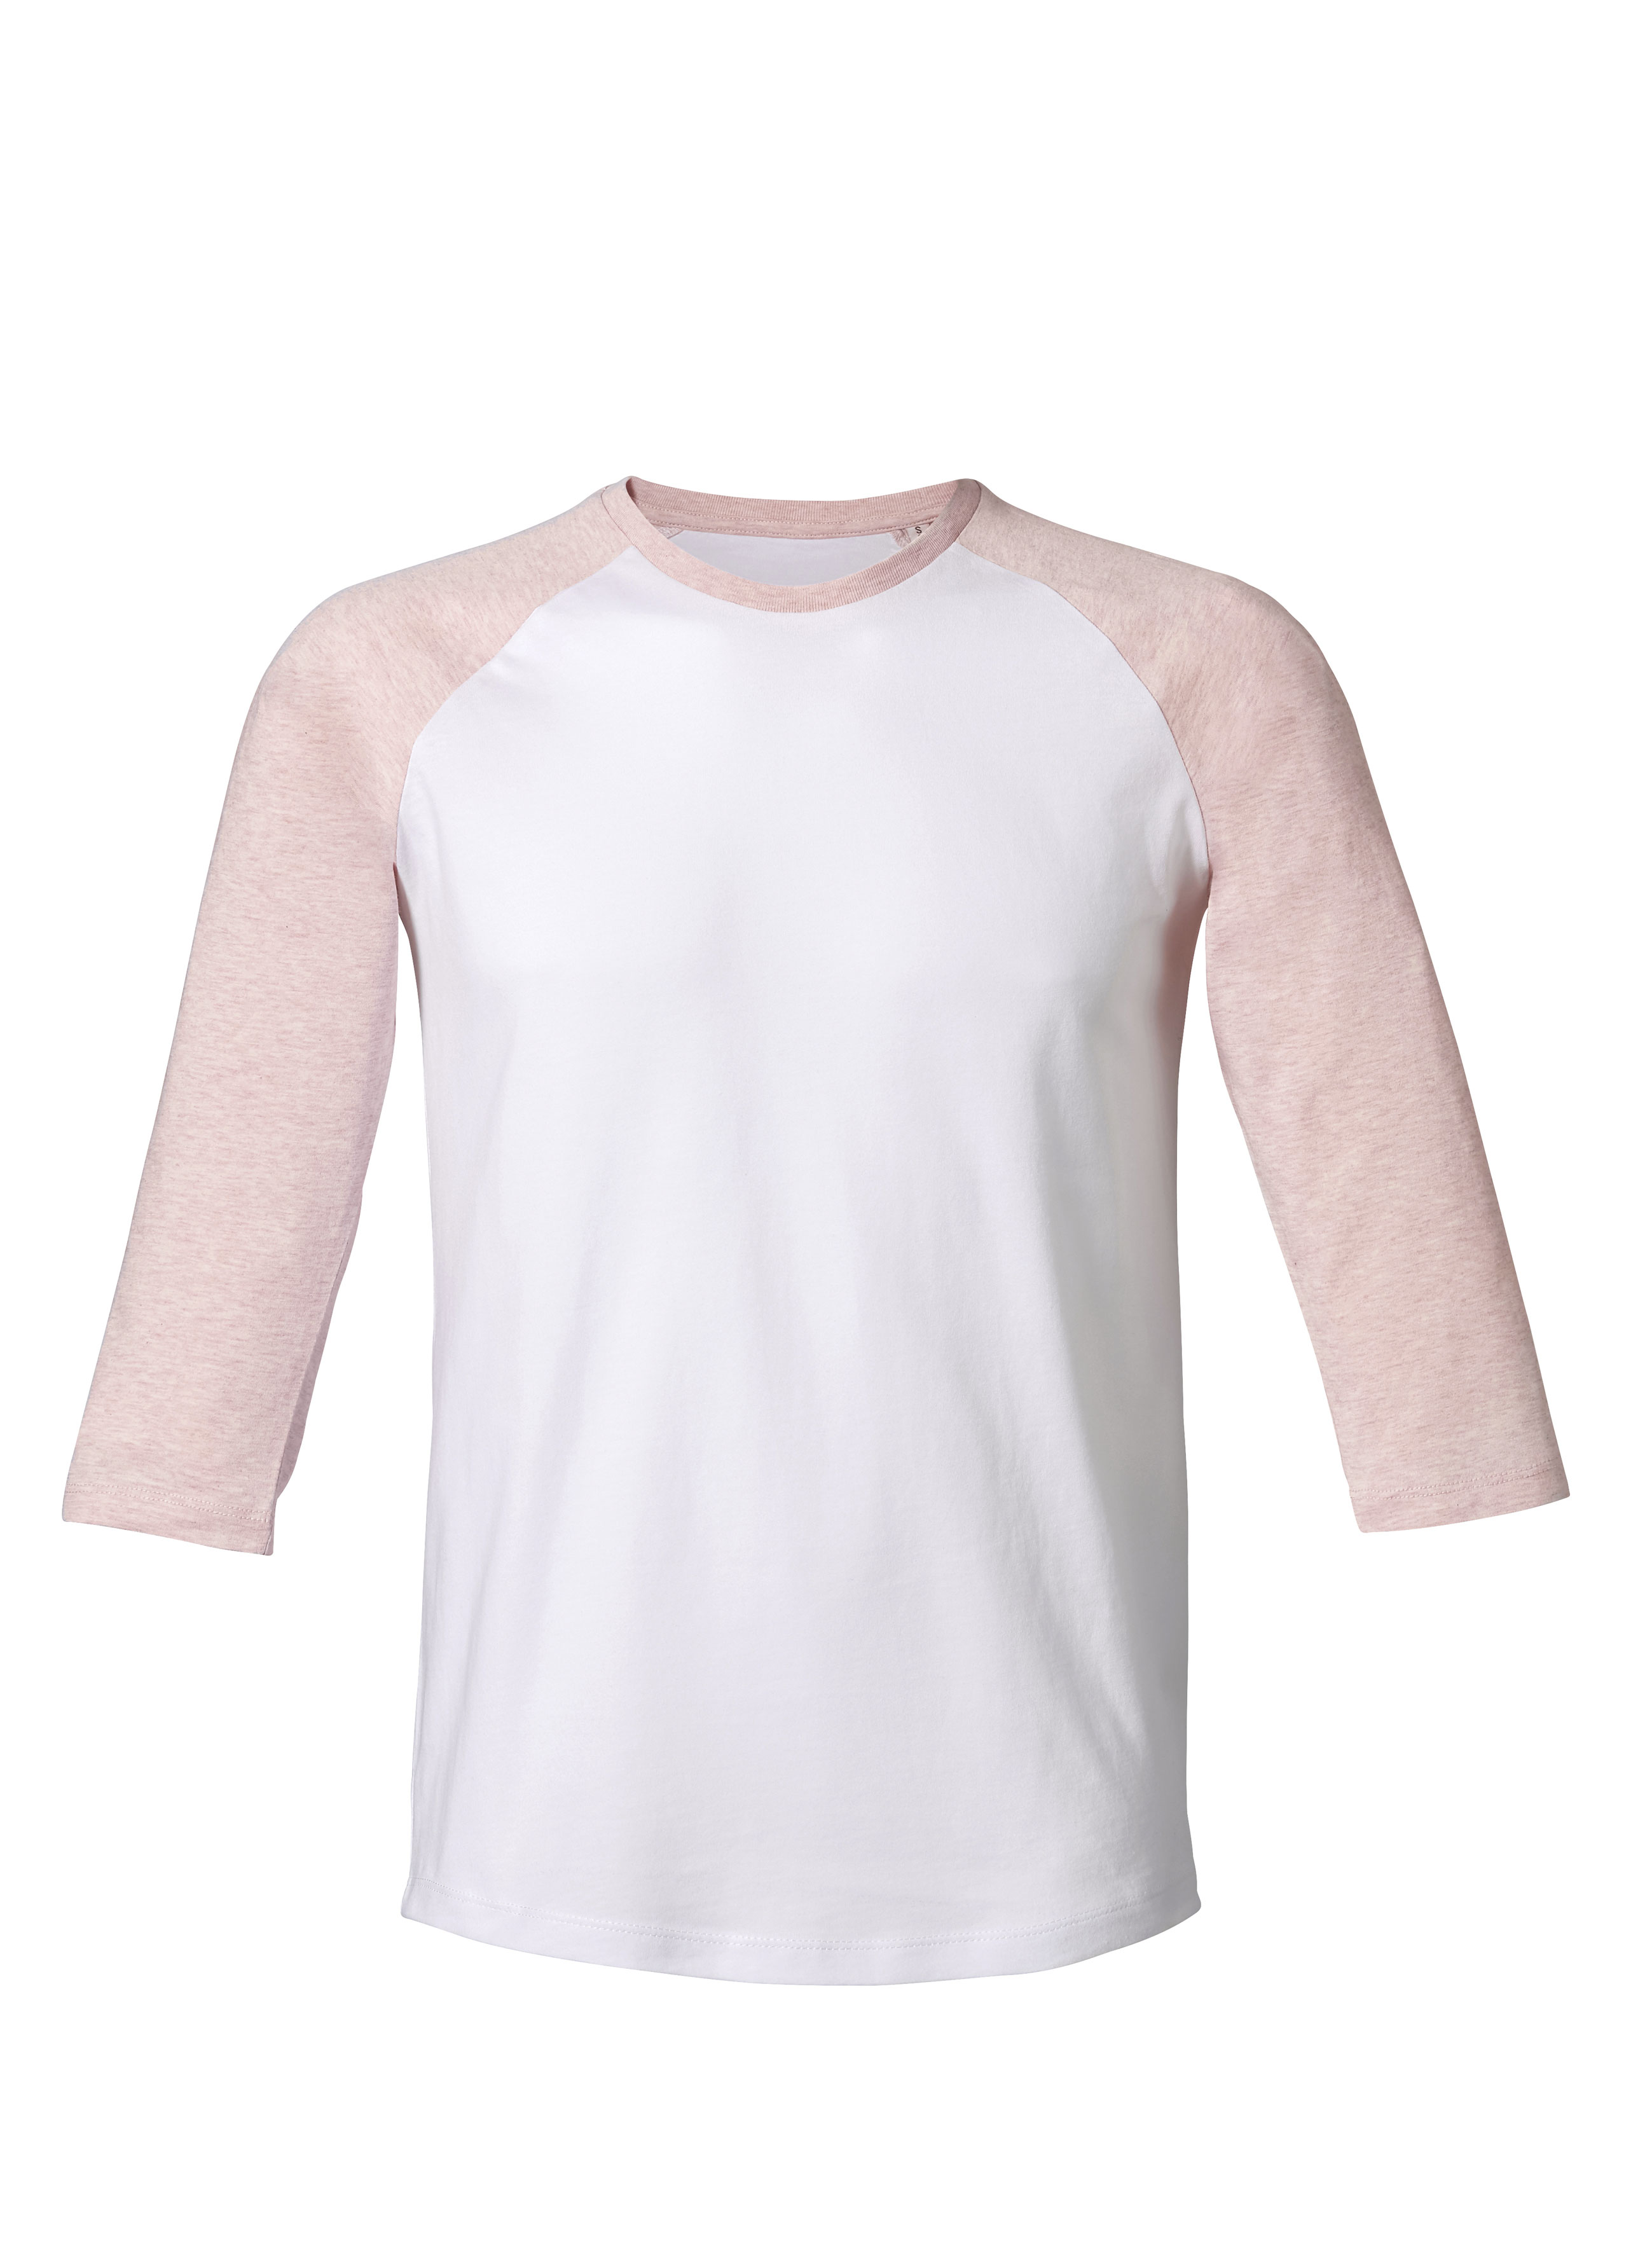 white - cream heather pink